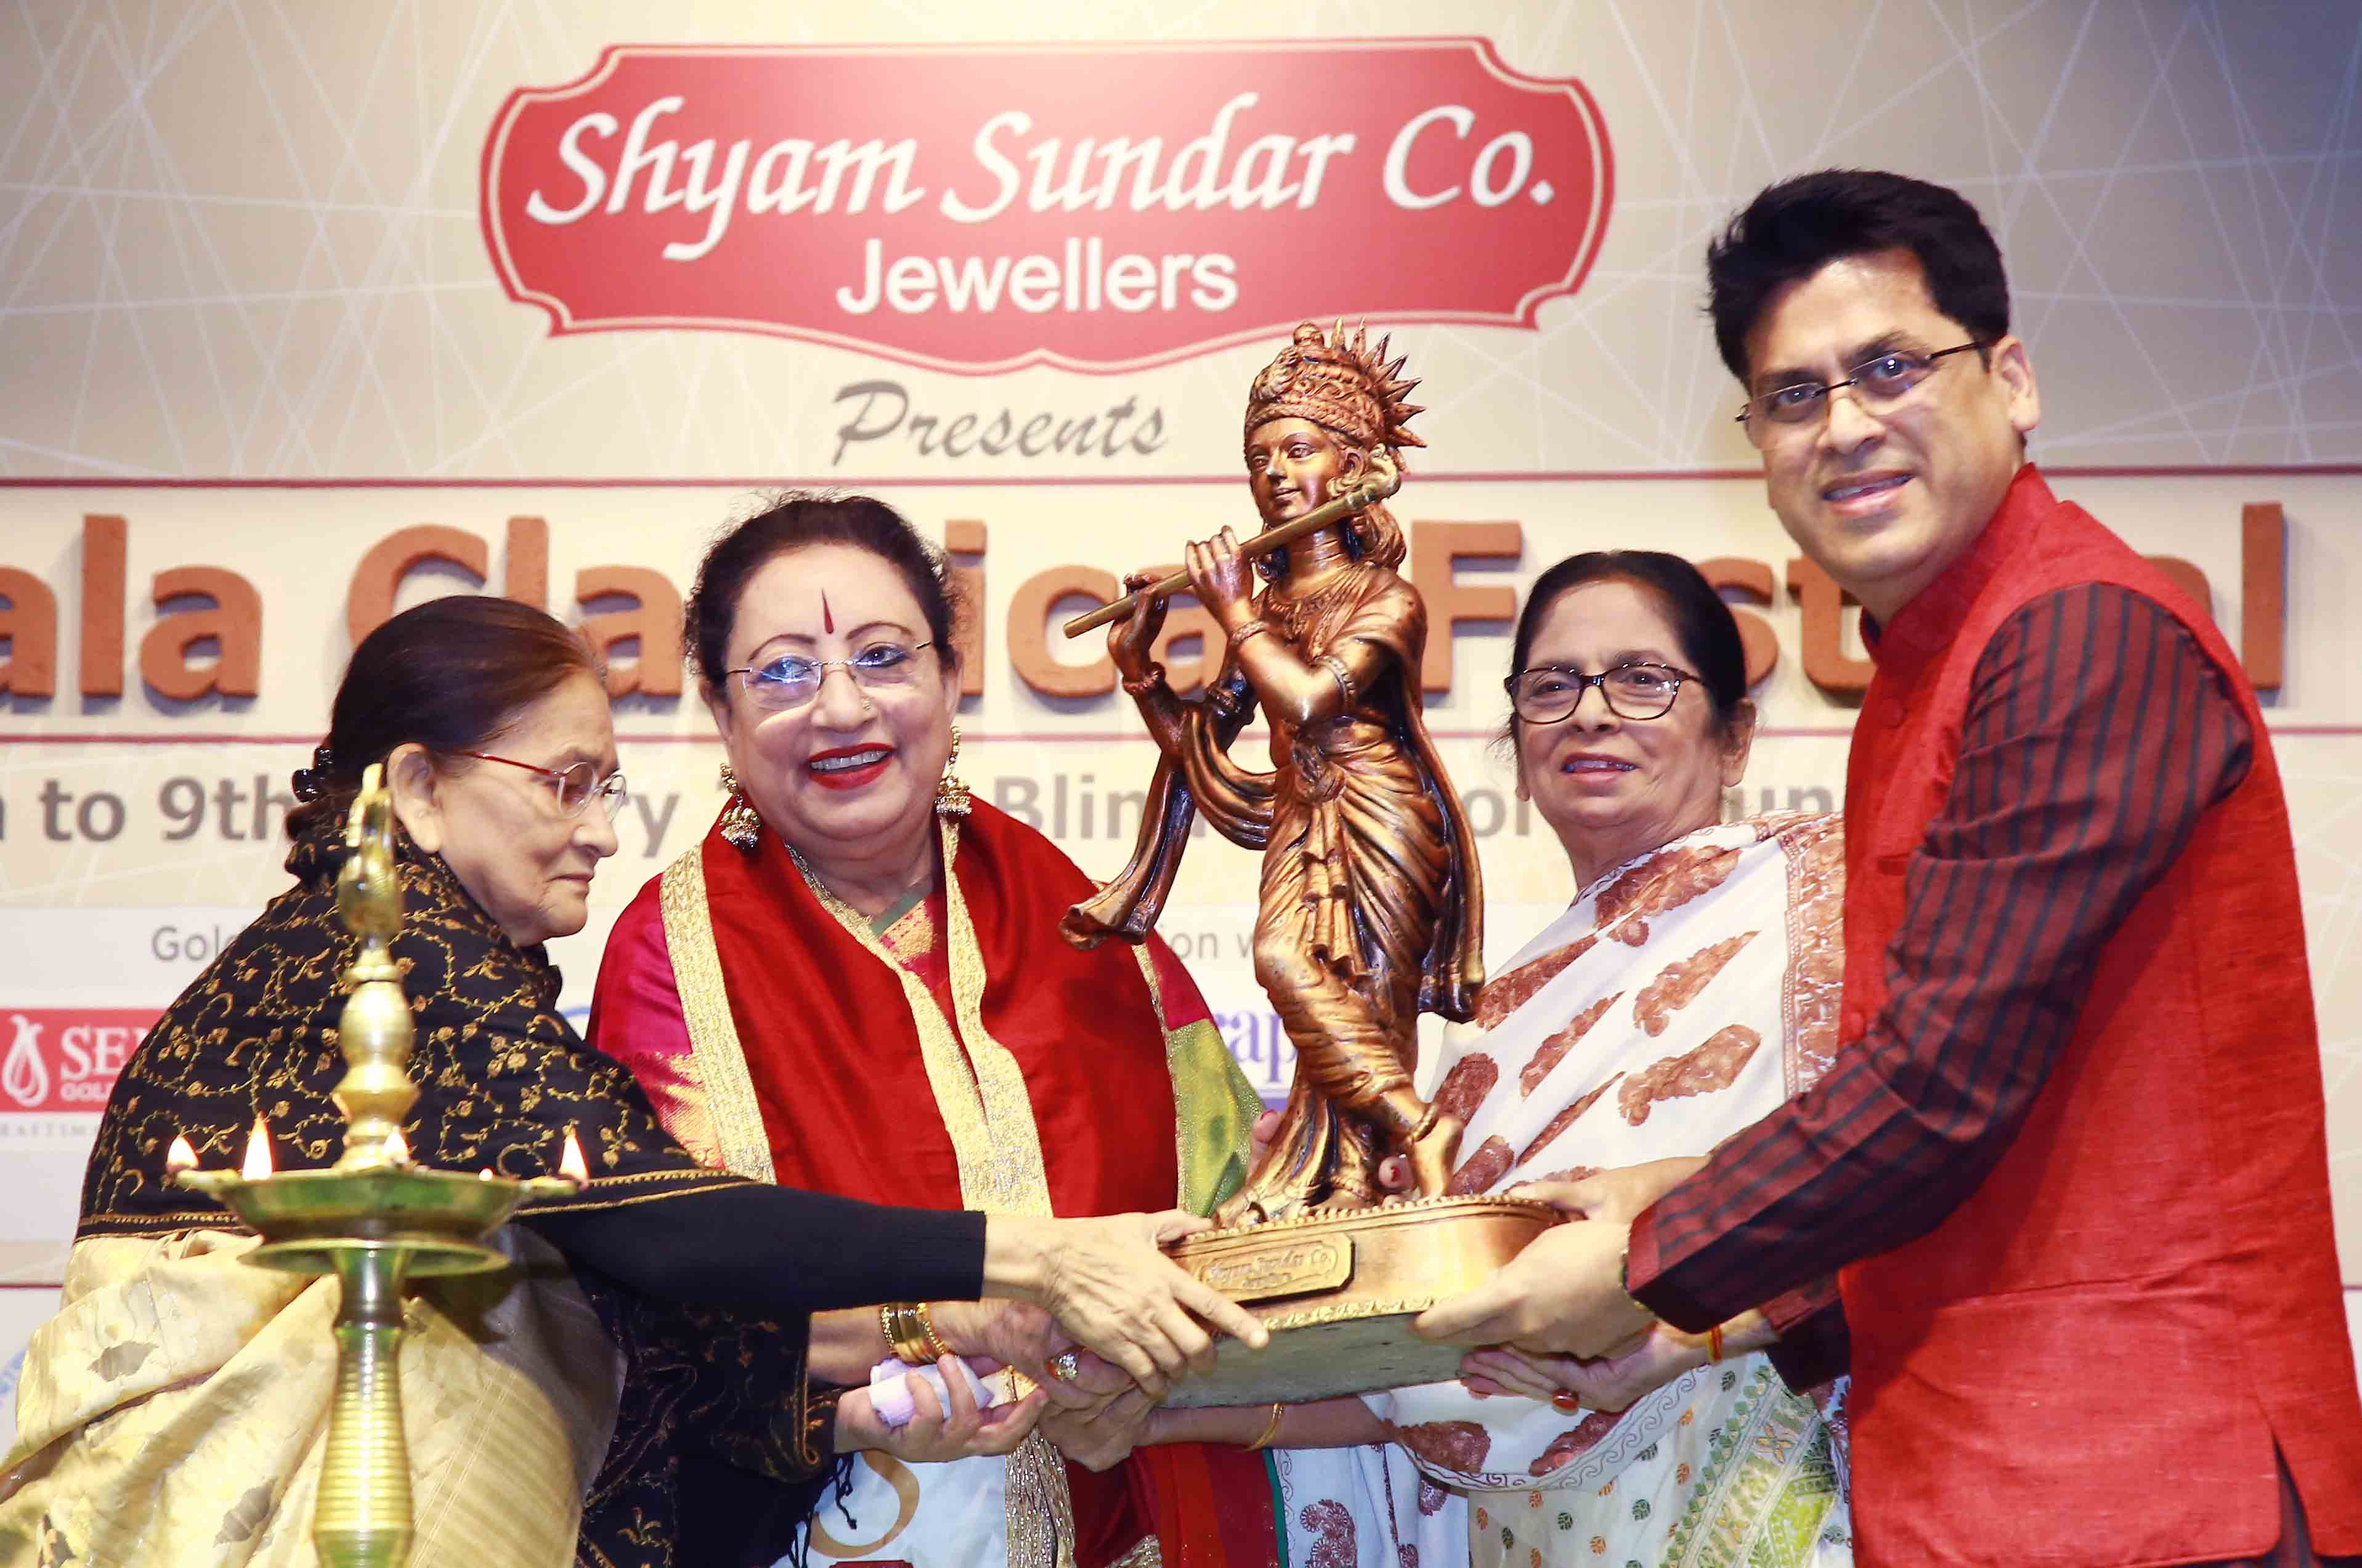 Shyam Sundar Co. Sarvottam Samman to the Classical Vocalist Par Excellence Begum Parveen Sultana